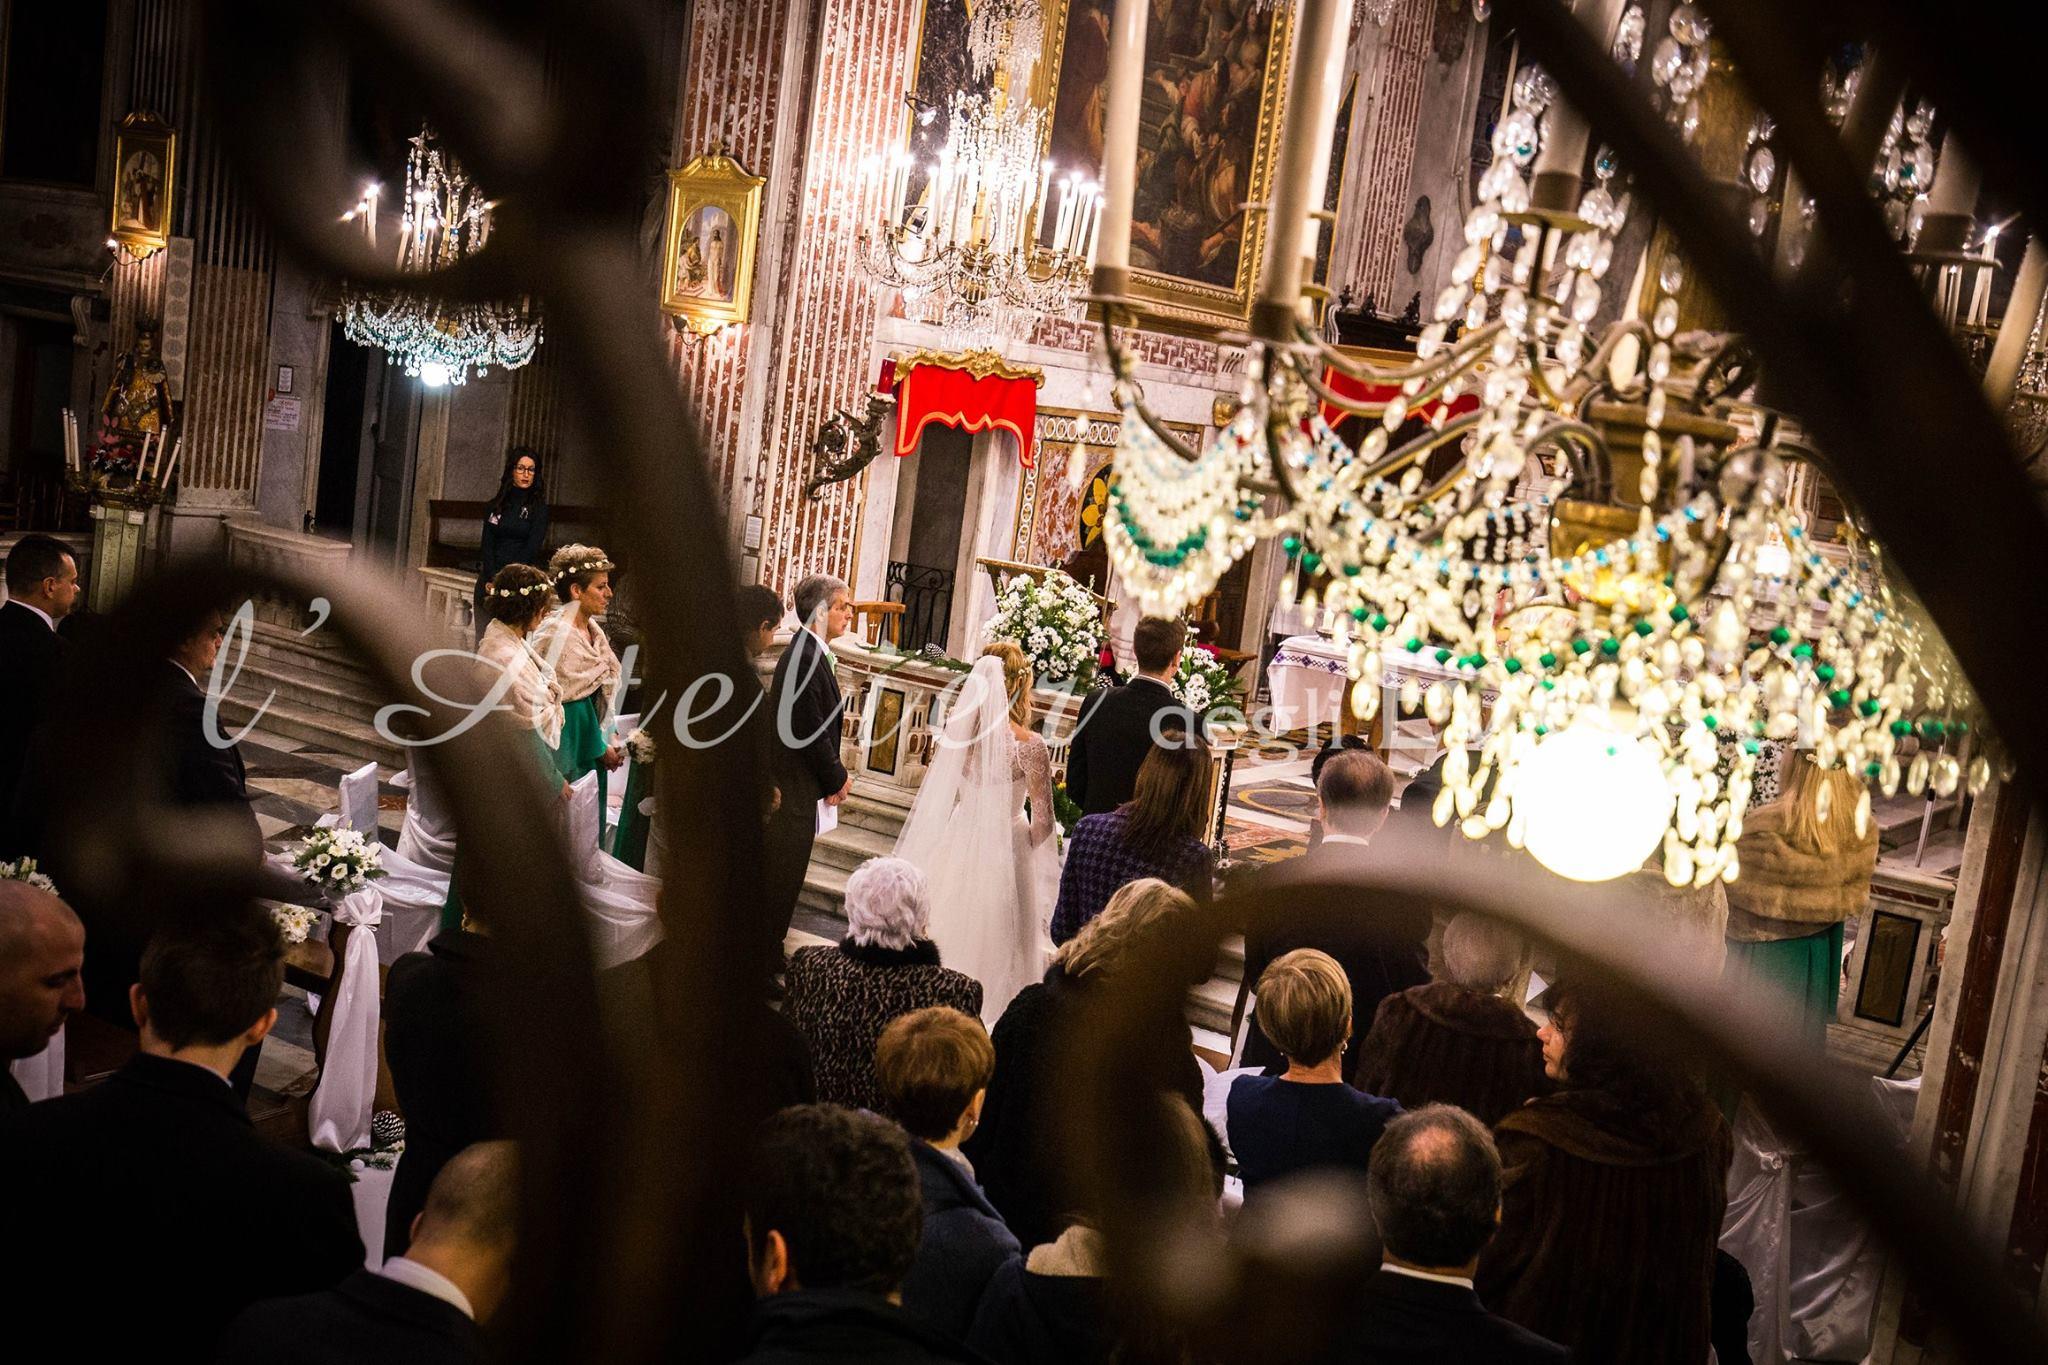 13_fotografo_per_matrimoni_matrimonio_liguria_genova_sposi